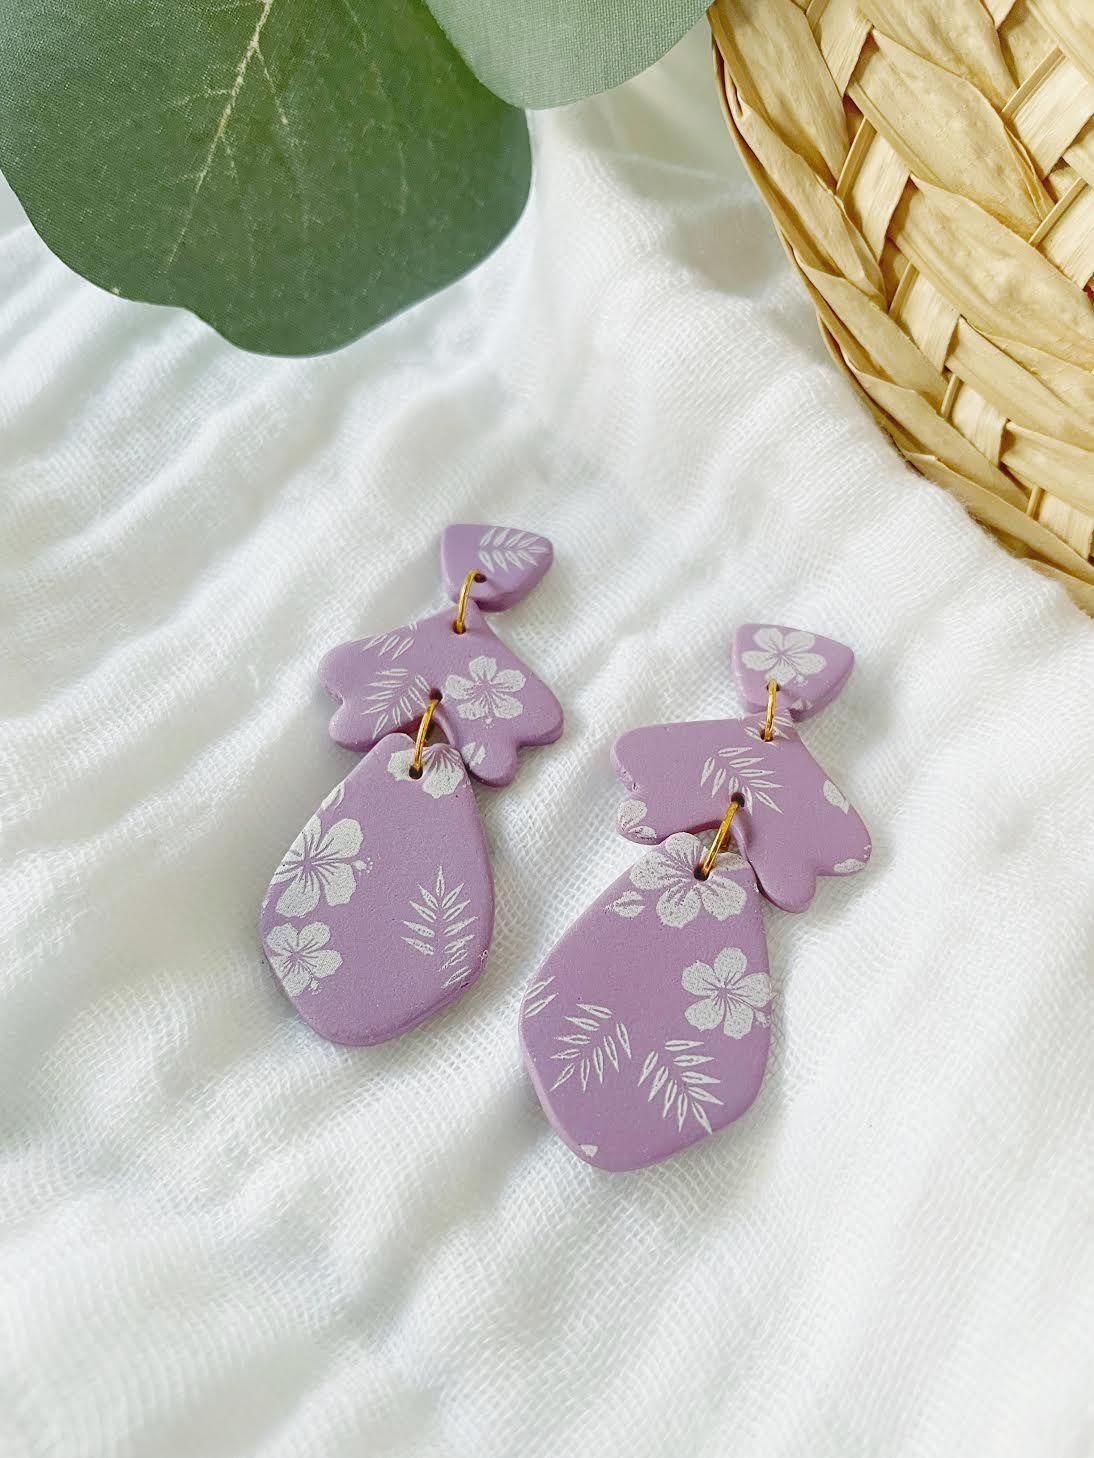 Hibiscus Clay Drop Earrings – Adult Drop / 18K Gold